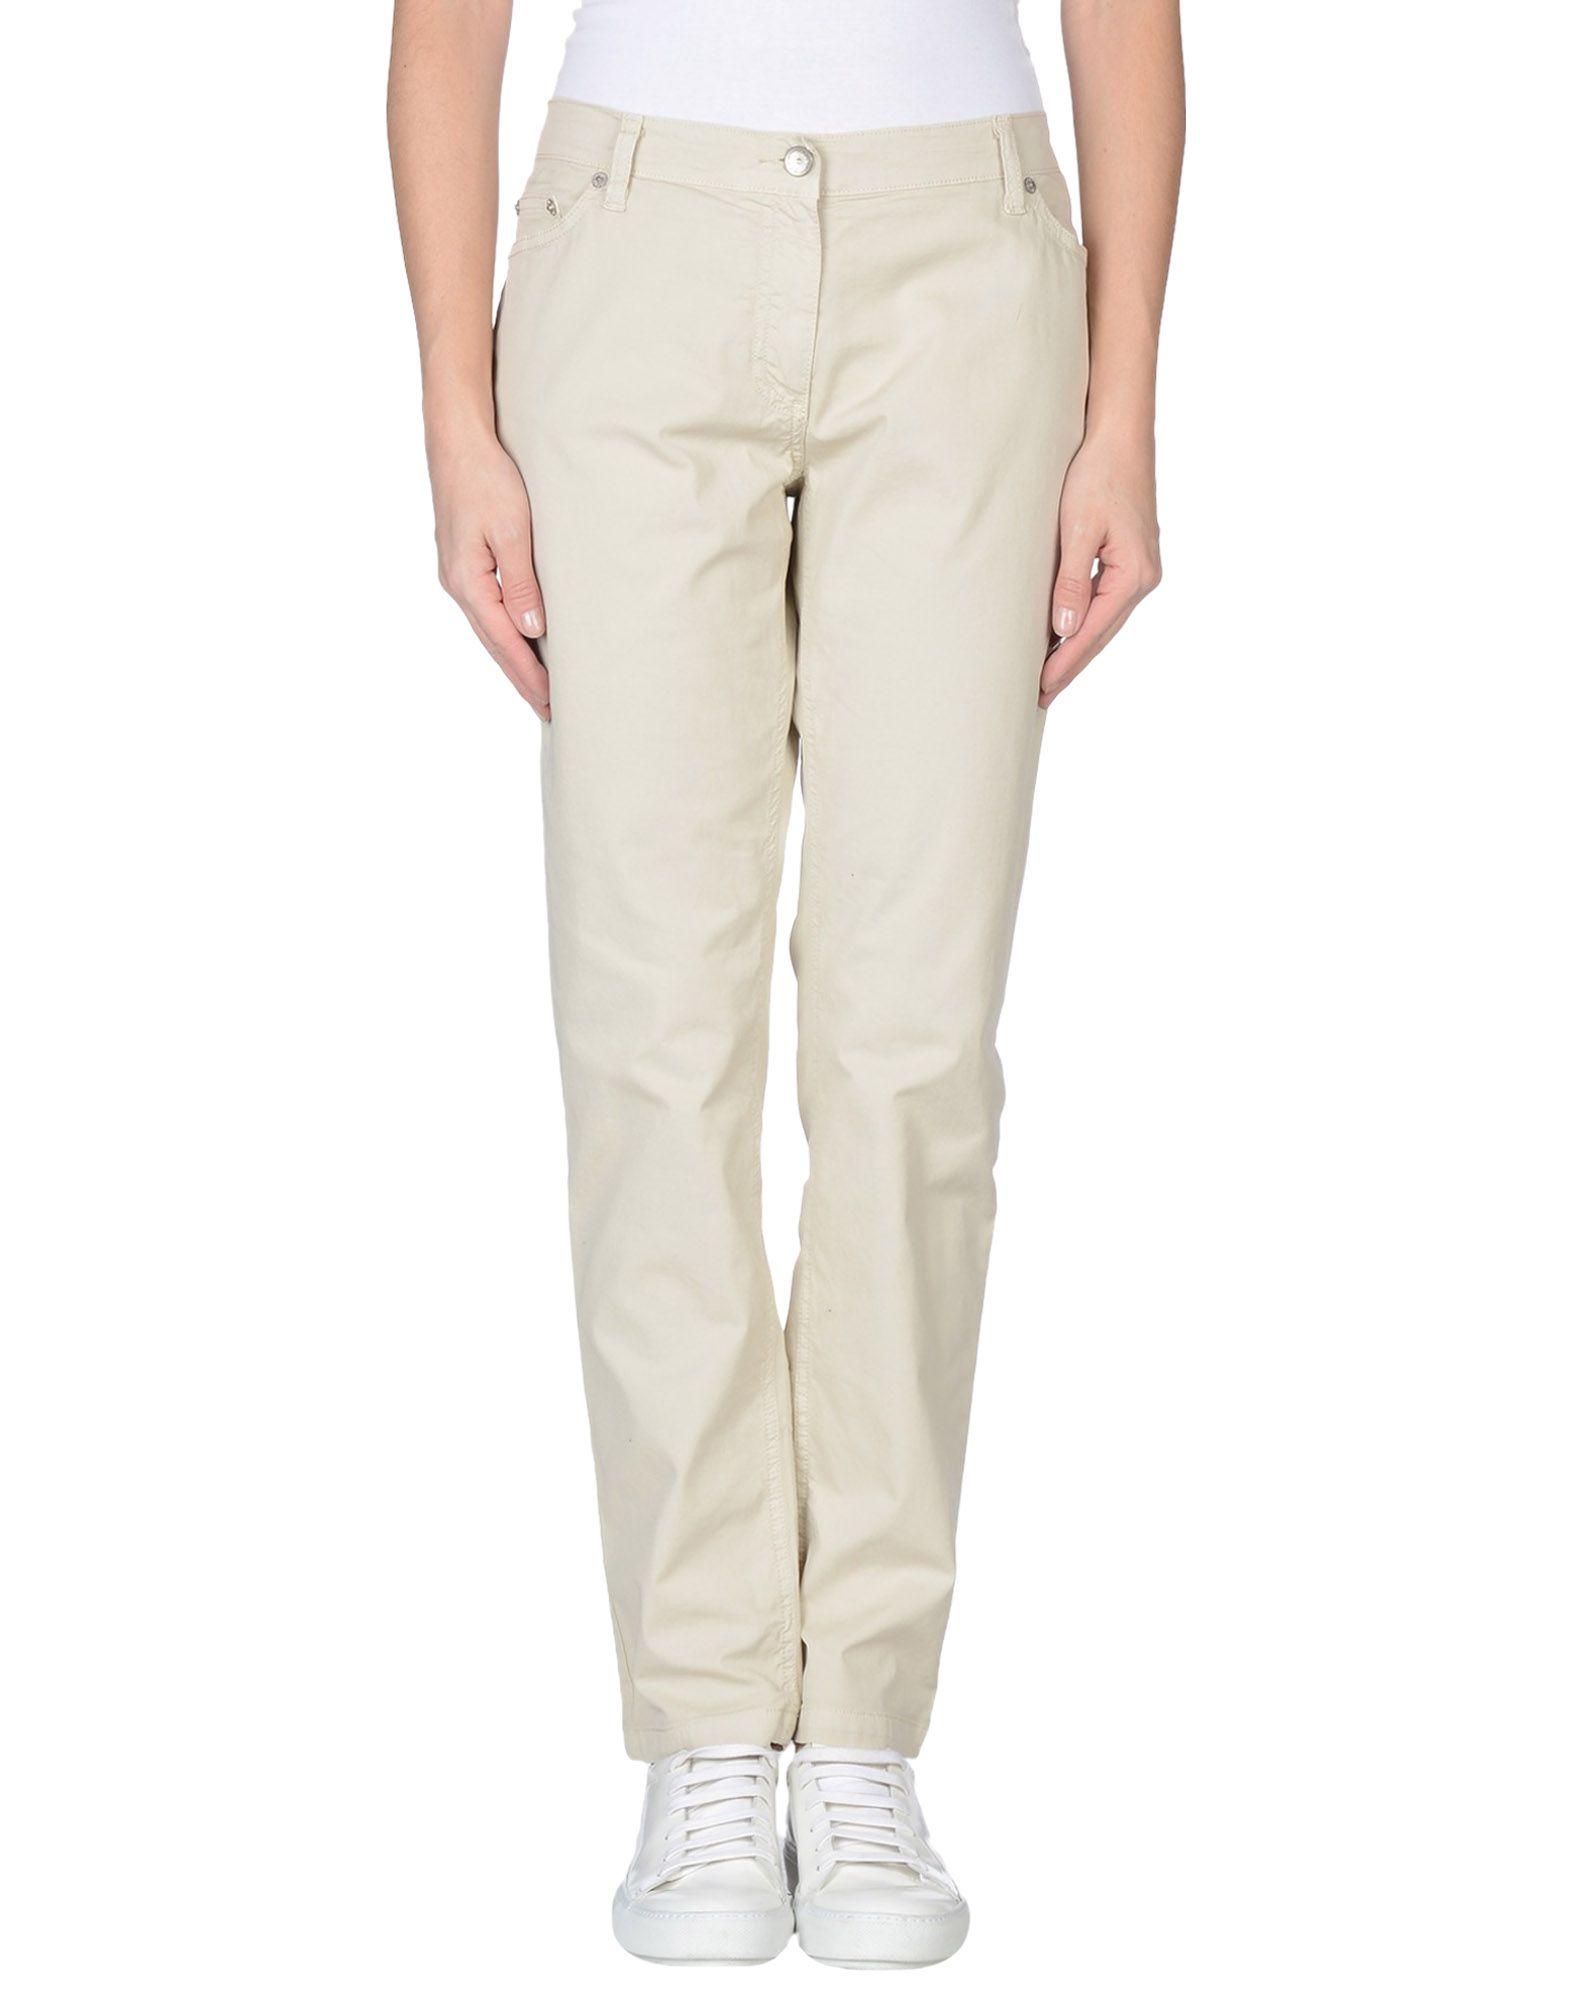 FRED PERRY Damen Hose Farbe Beige Größe 3